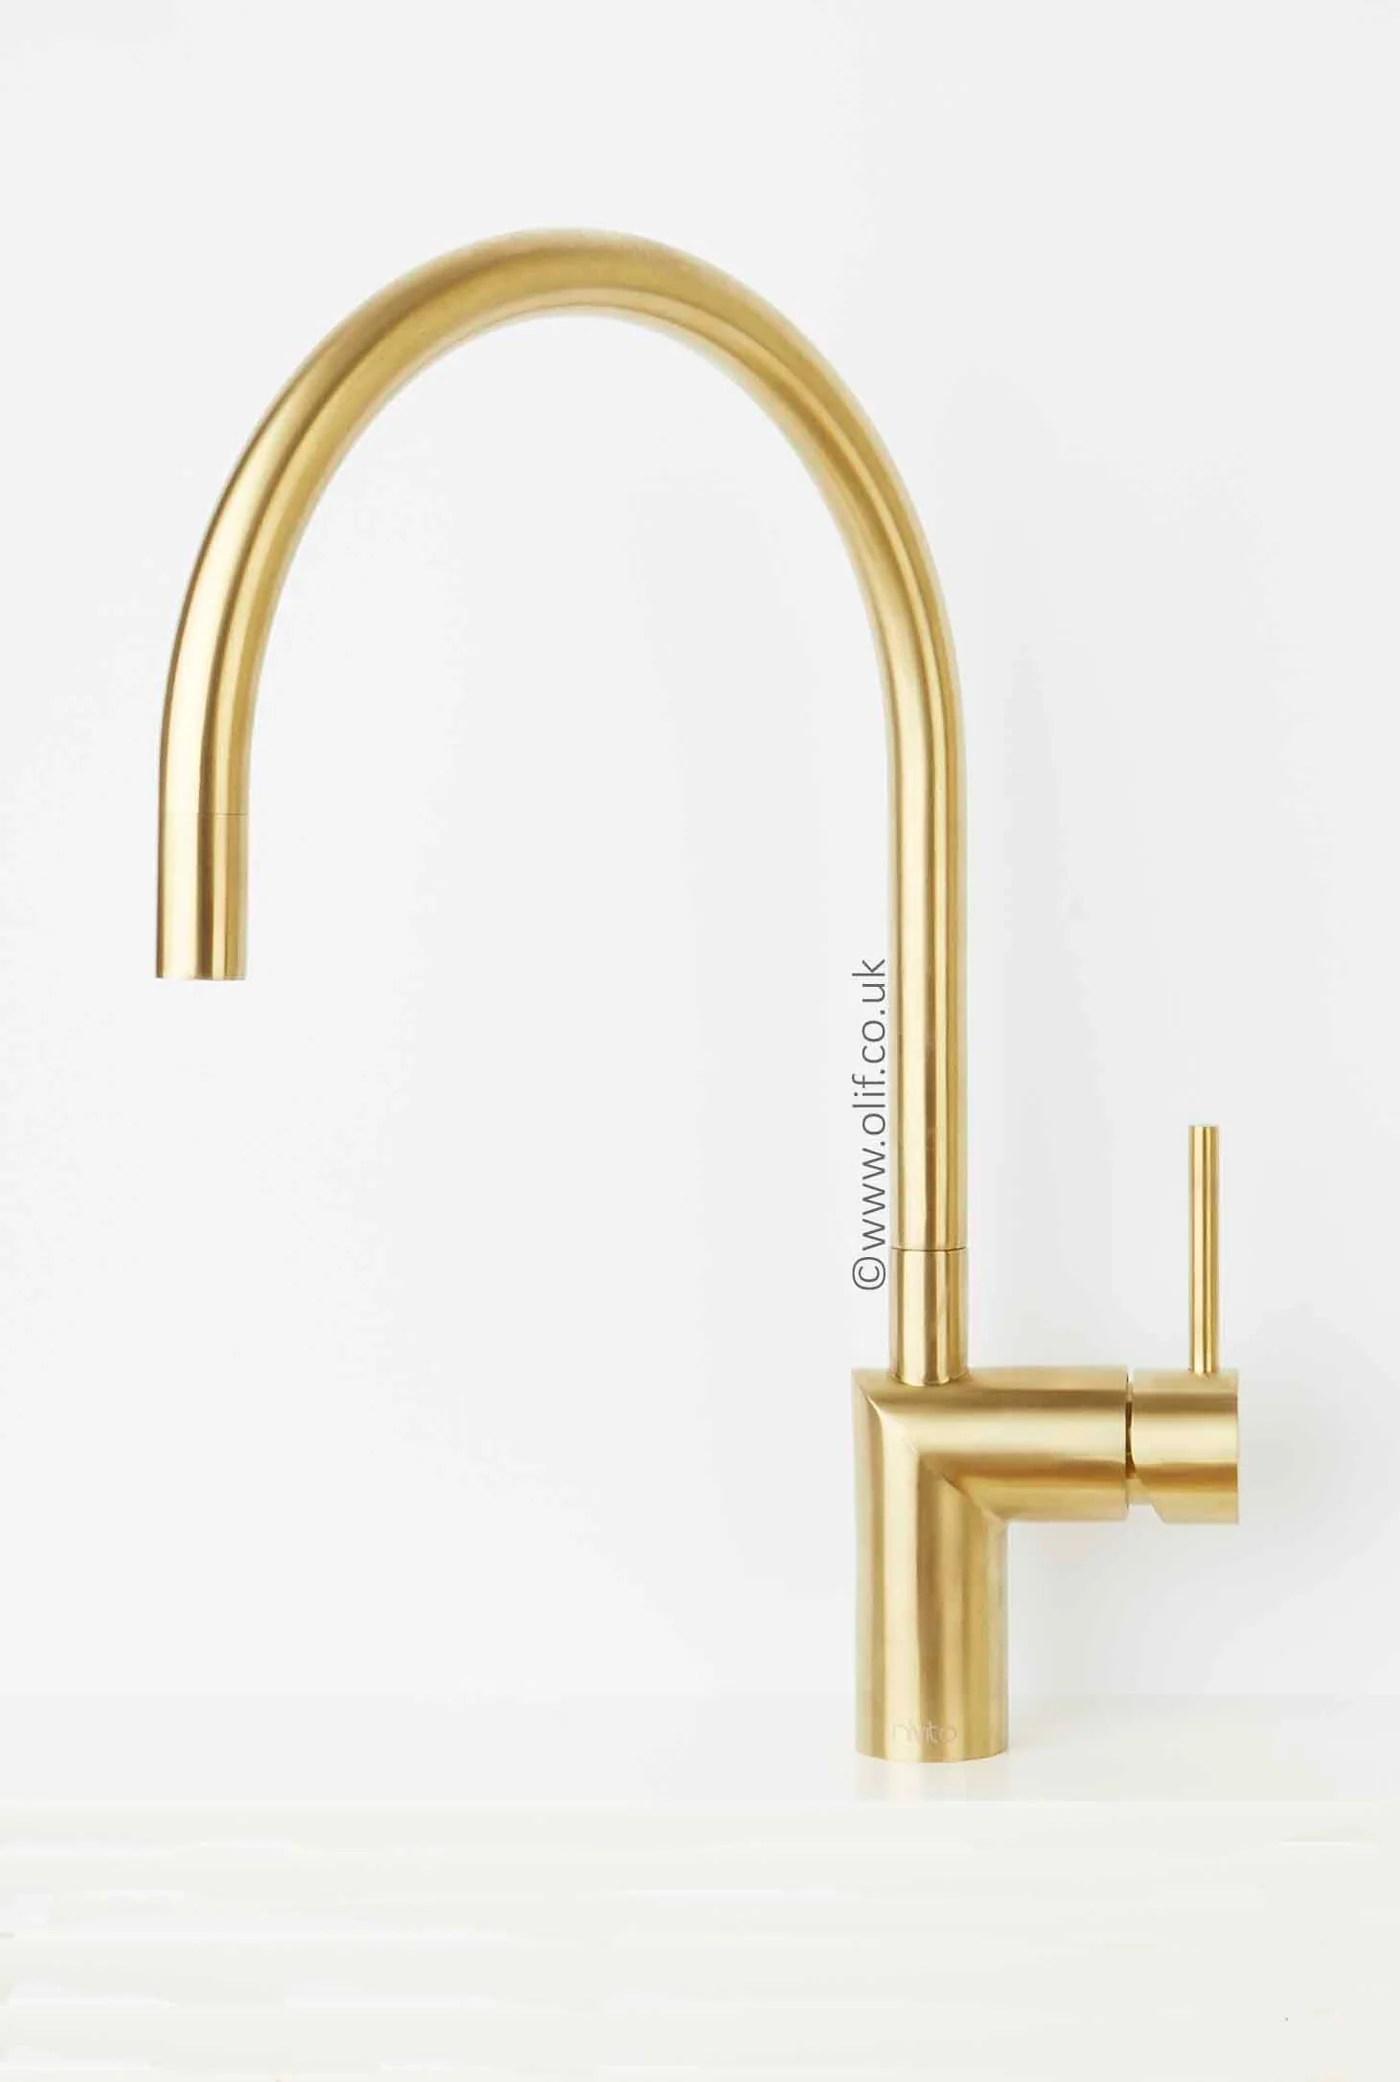 nivito rh 140 brushed brass gold kitchen mixer tap